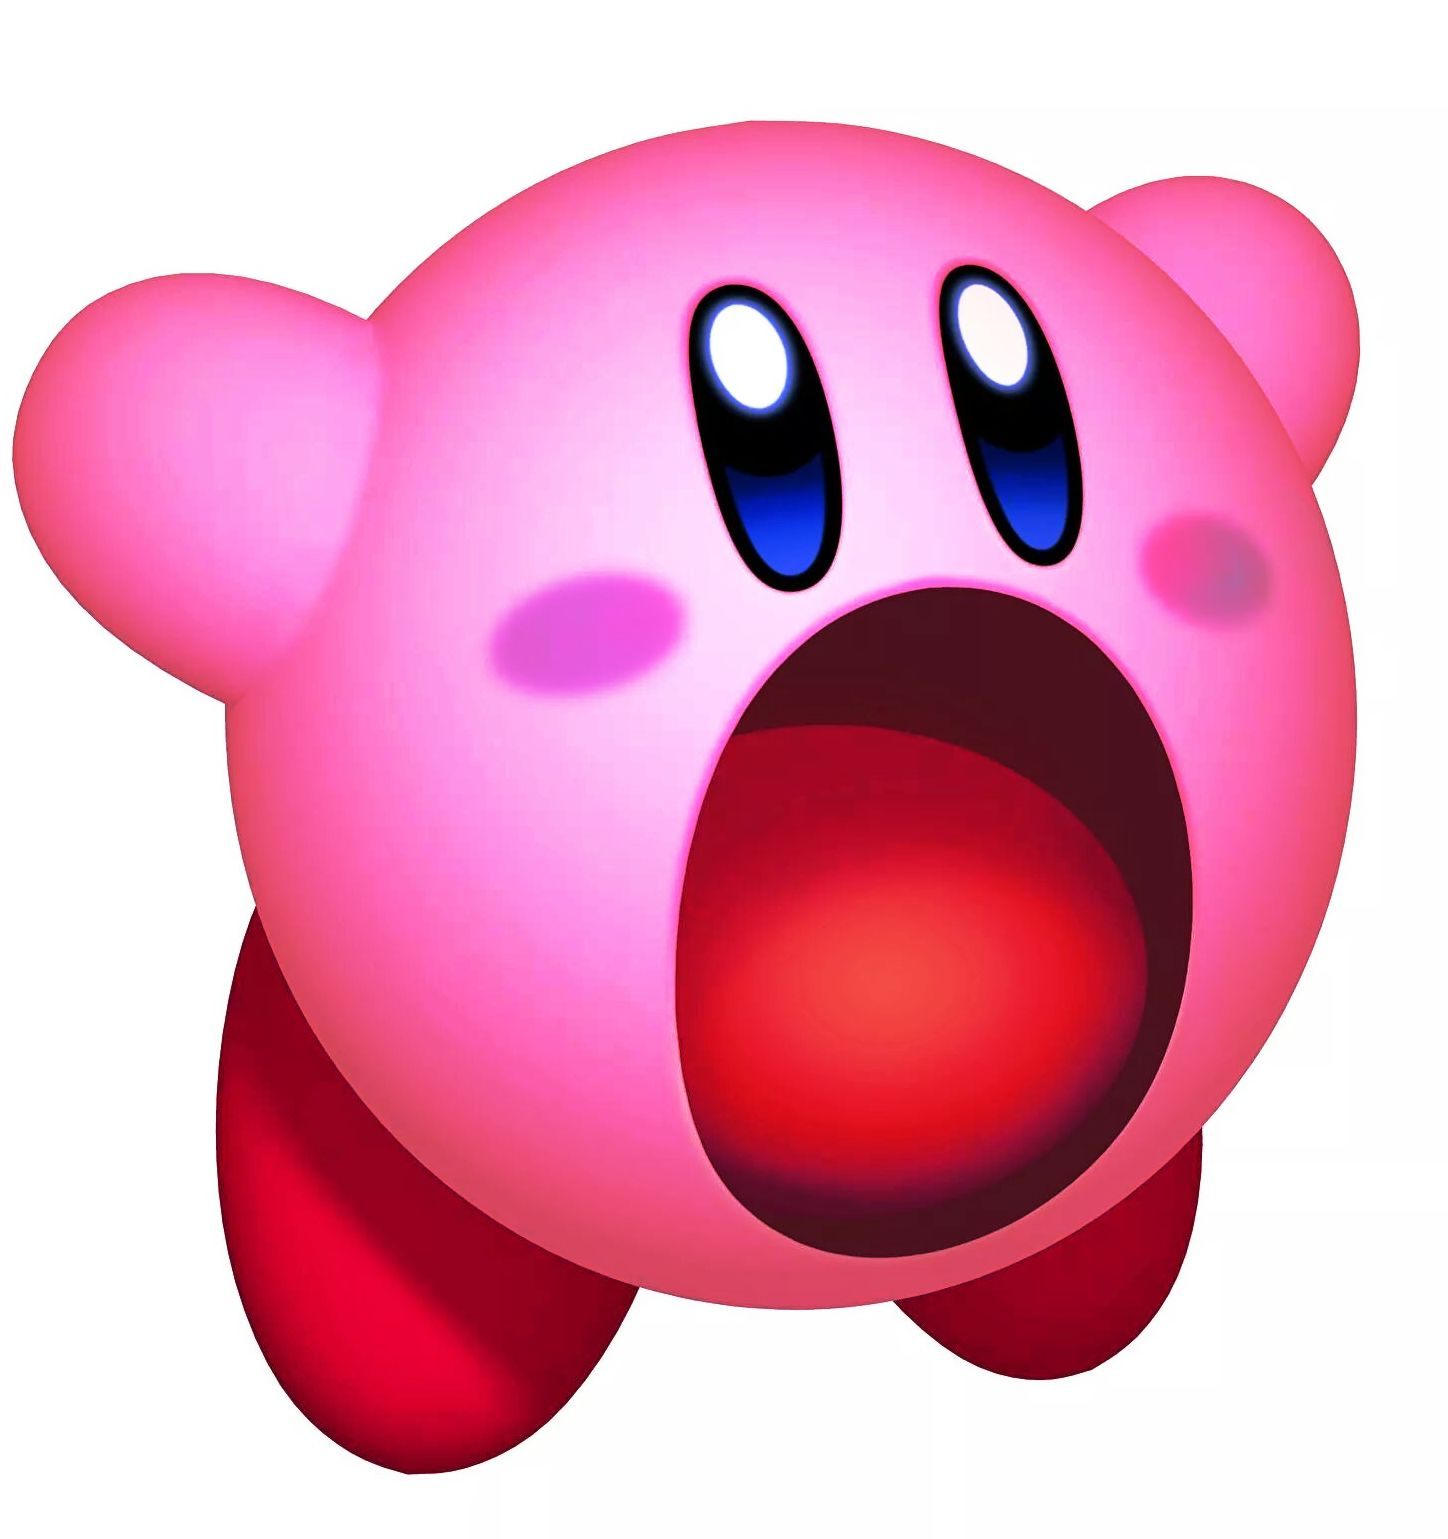 Imgagen con Kirby aspirando fuerte